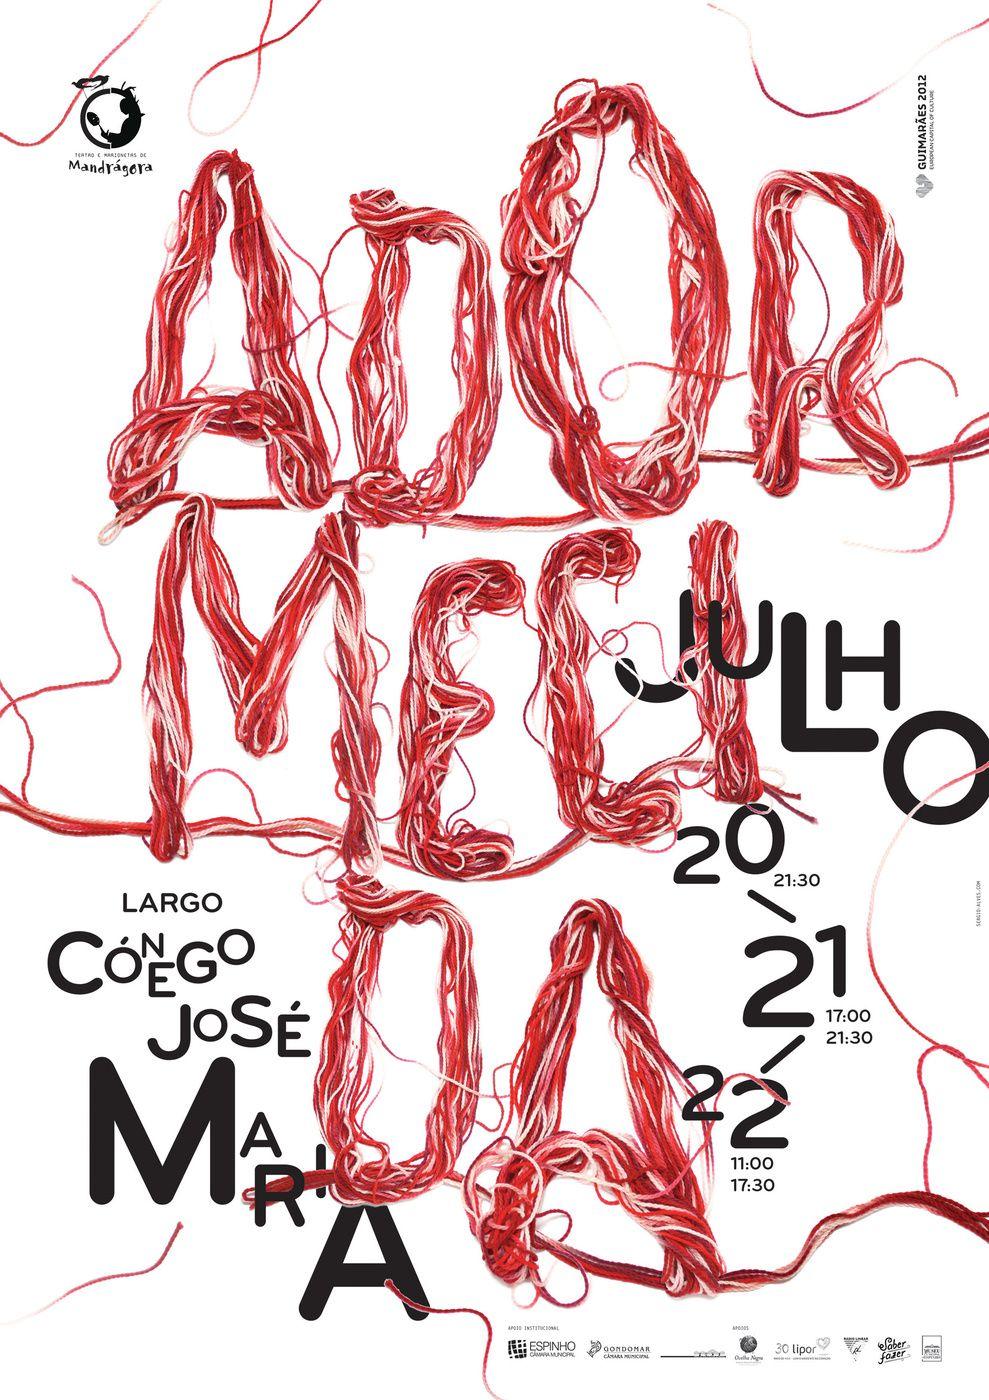 atelier d'alves - typo/graphic posters